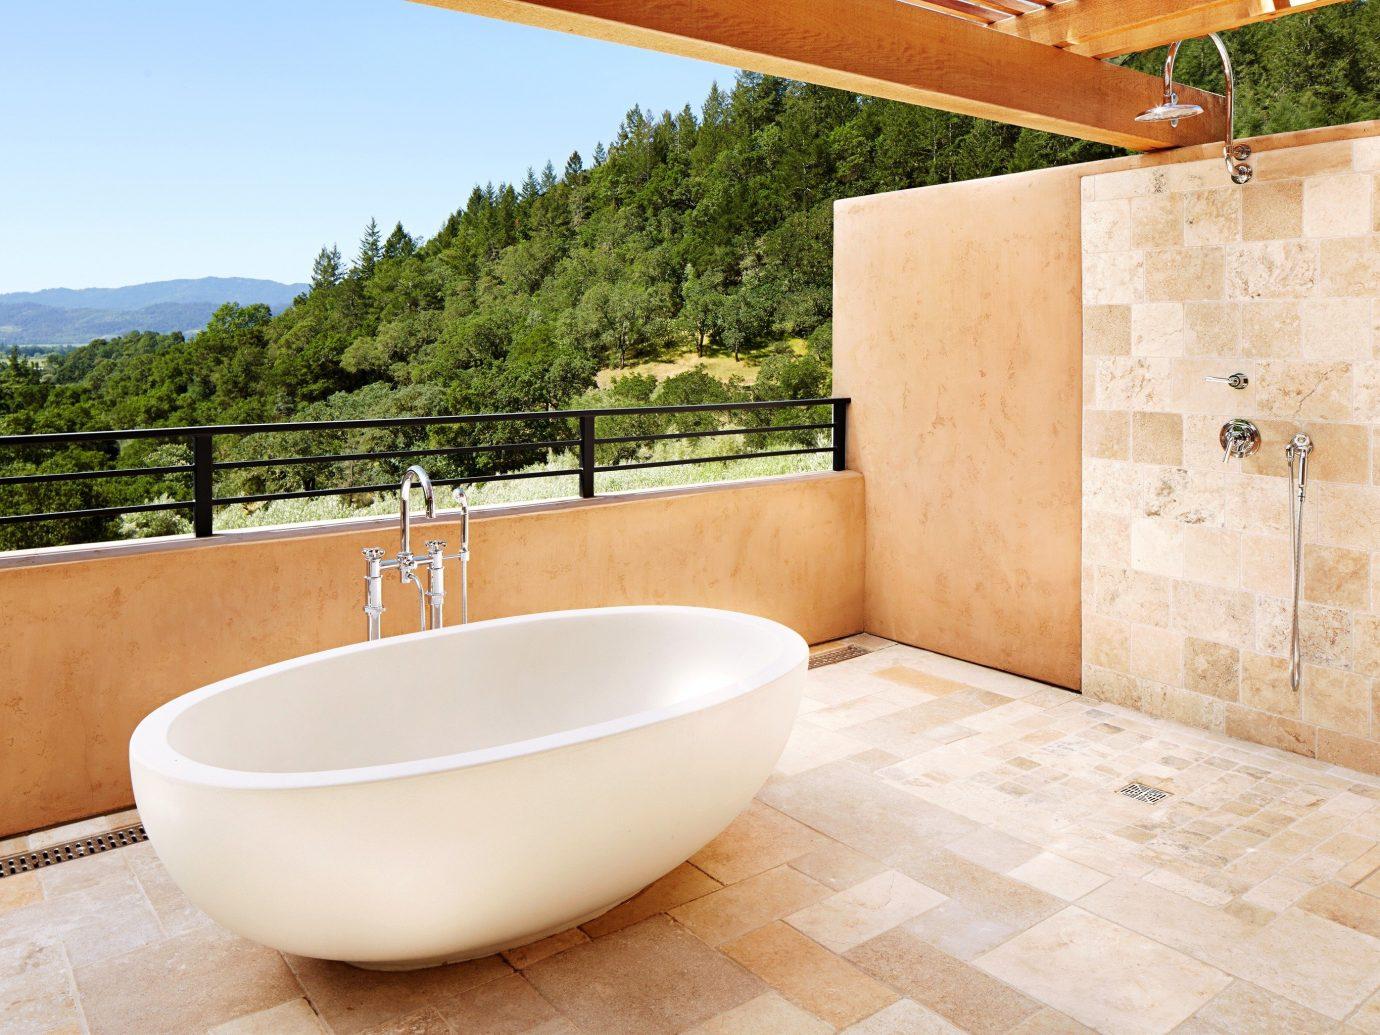 Hotels Offbeat room property swimming pool bathtub plumbing fixture floor bidet bathroom estate flooring sink tub stone